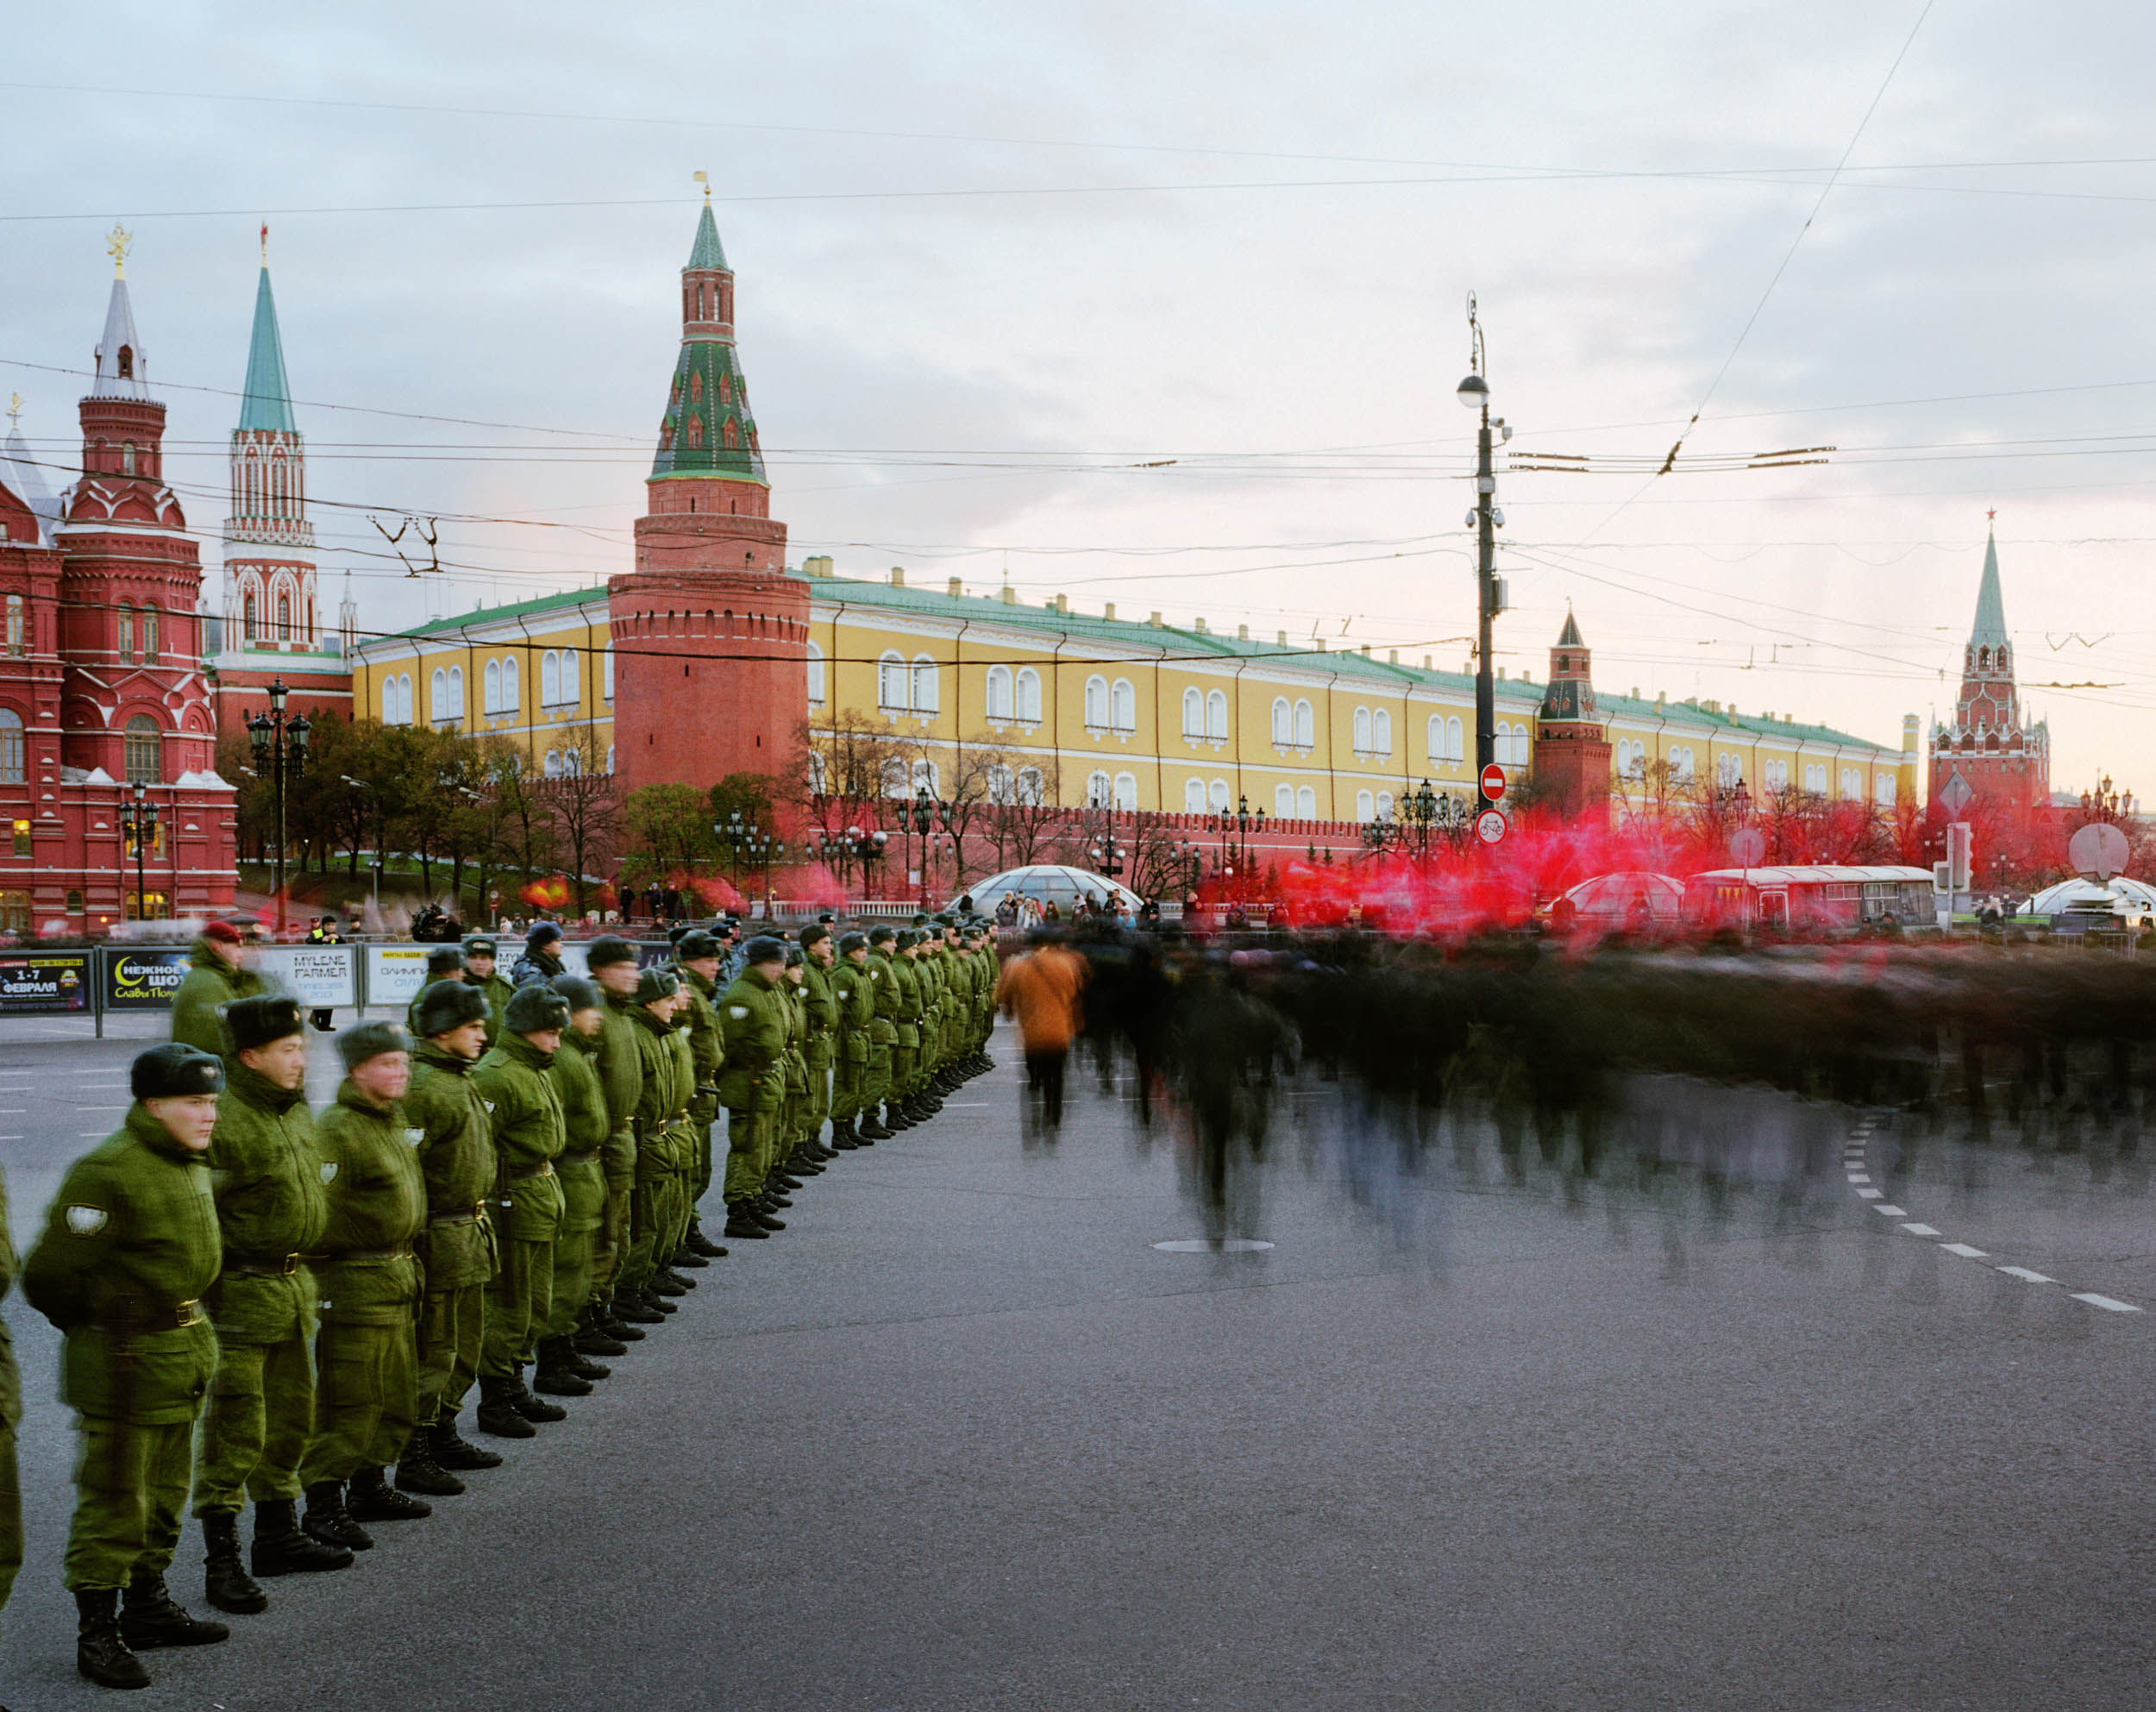 Manezhnaya Ploshchad, Tverskoy Rayon, Moscow, Russia (Communist protestors)